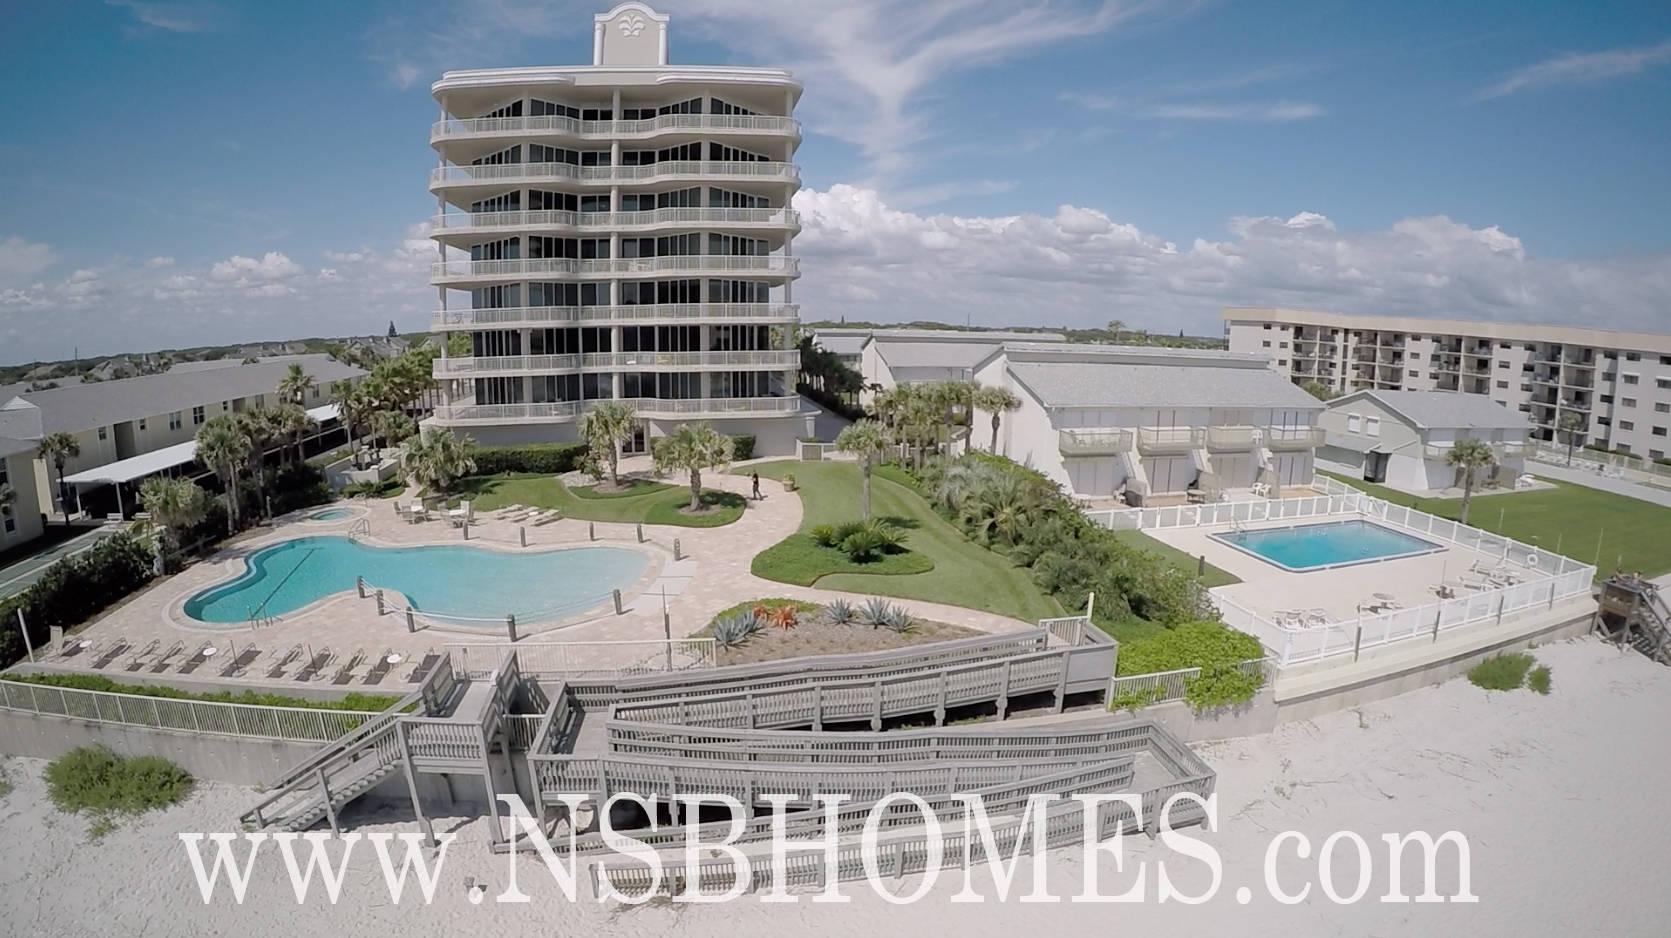 The Fountains Condo for Sale 4207 S Atlantic New Smyrna Beach